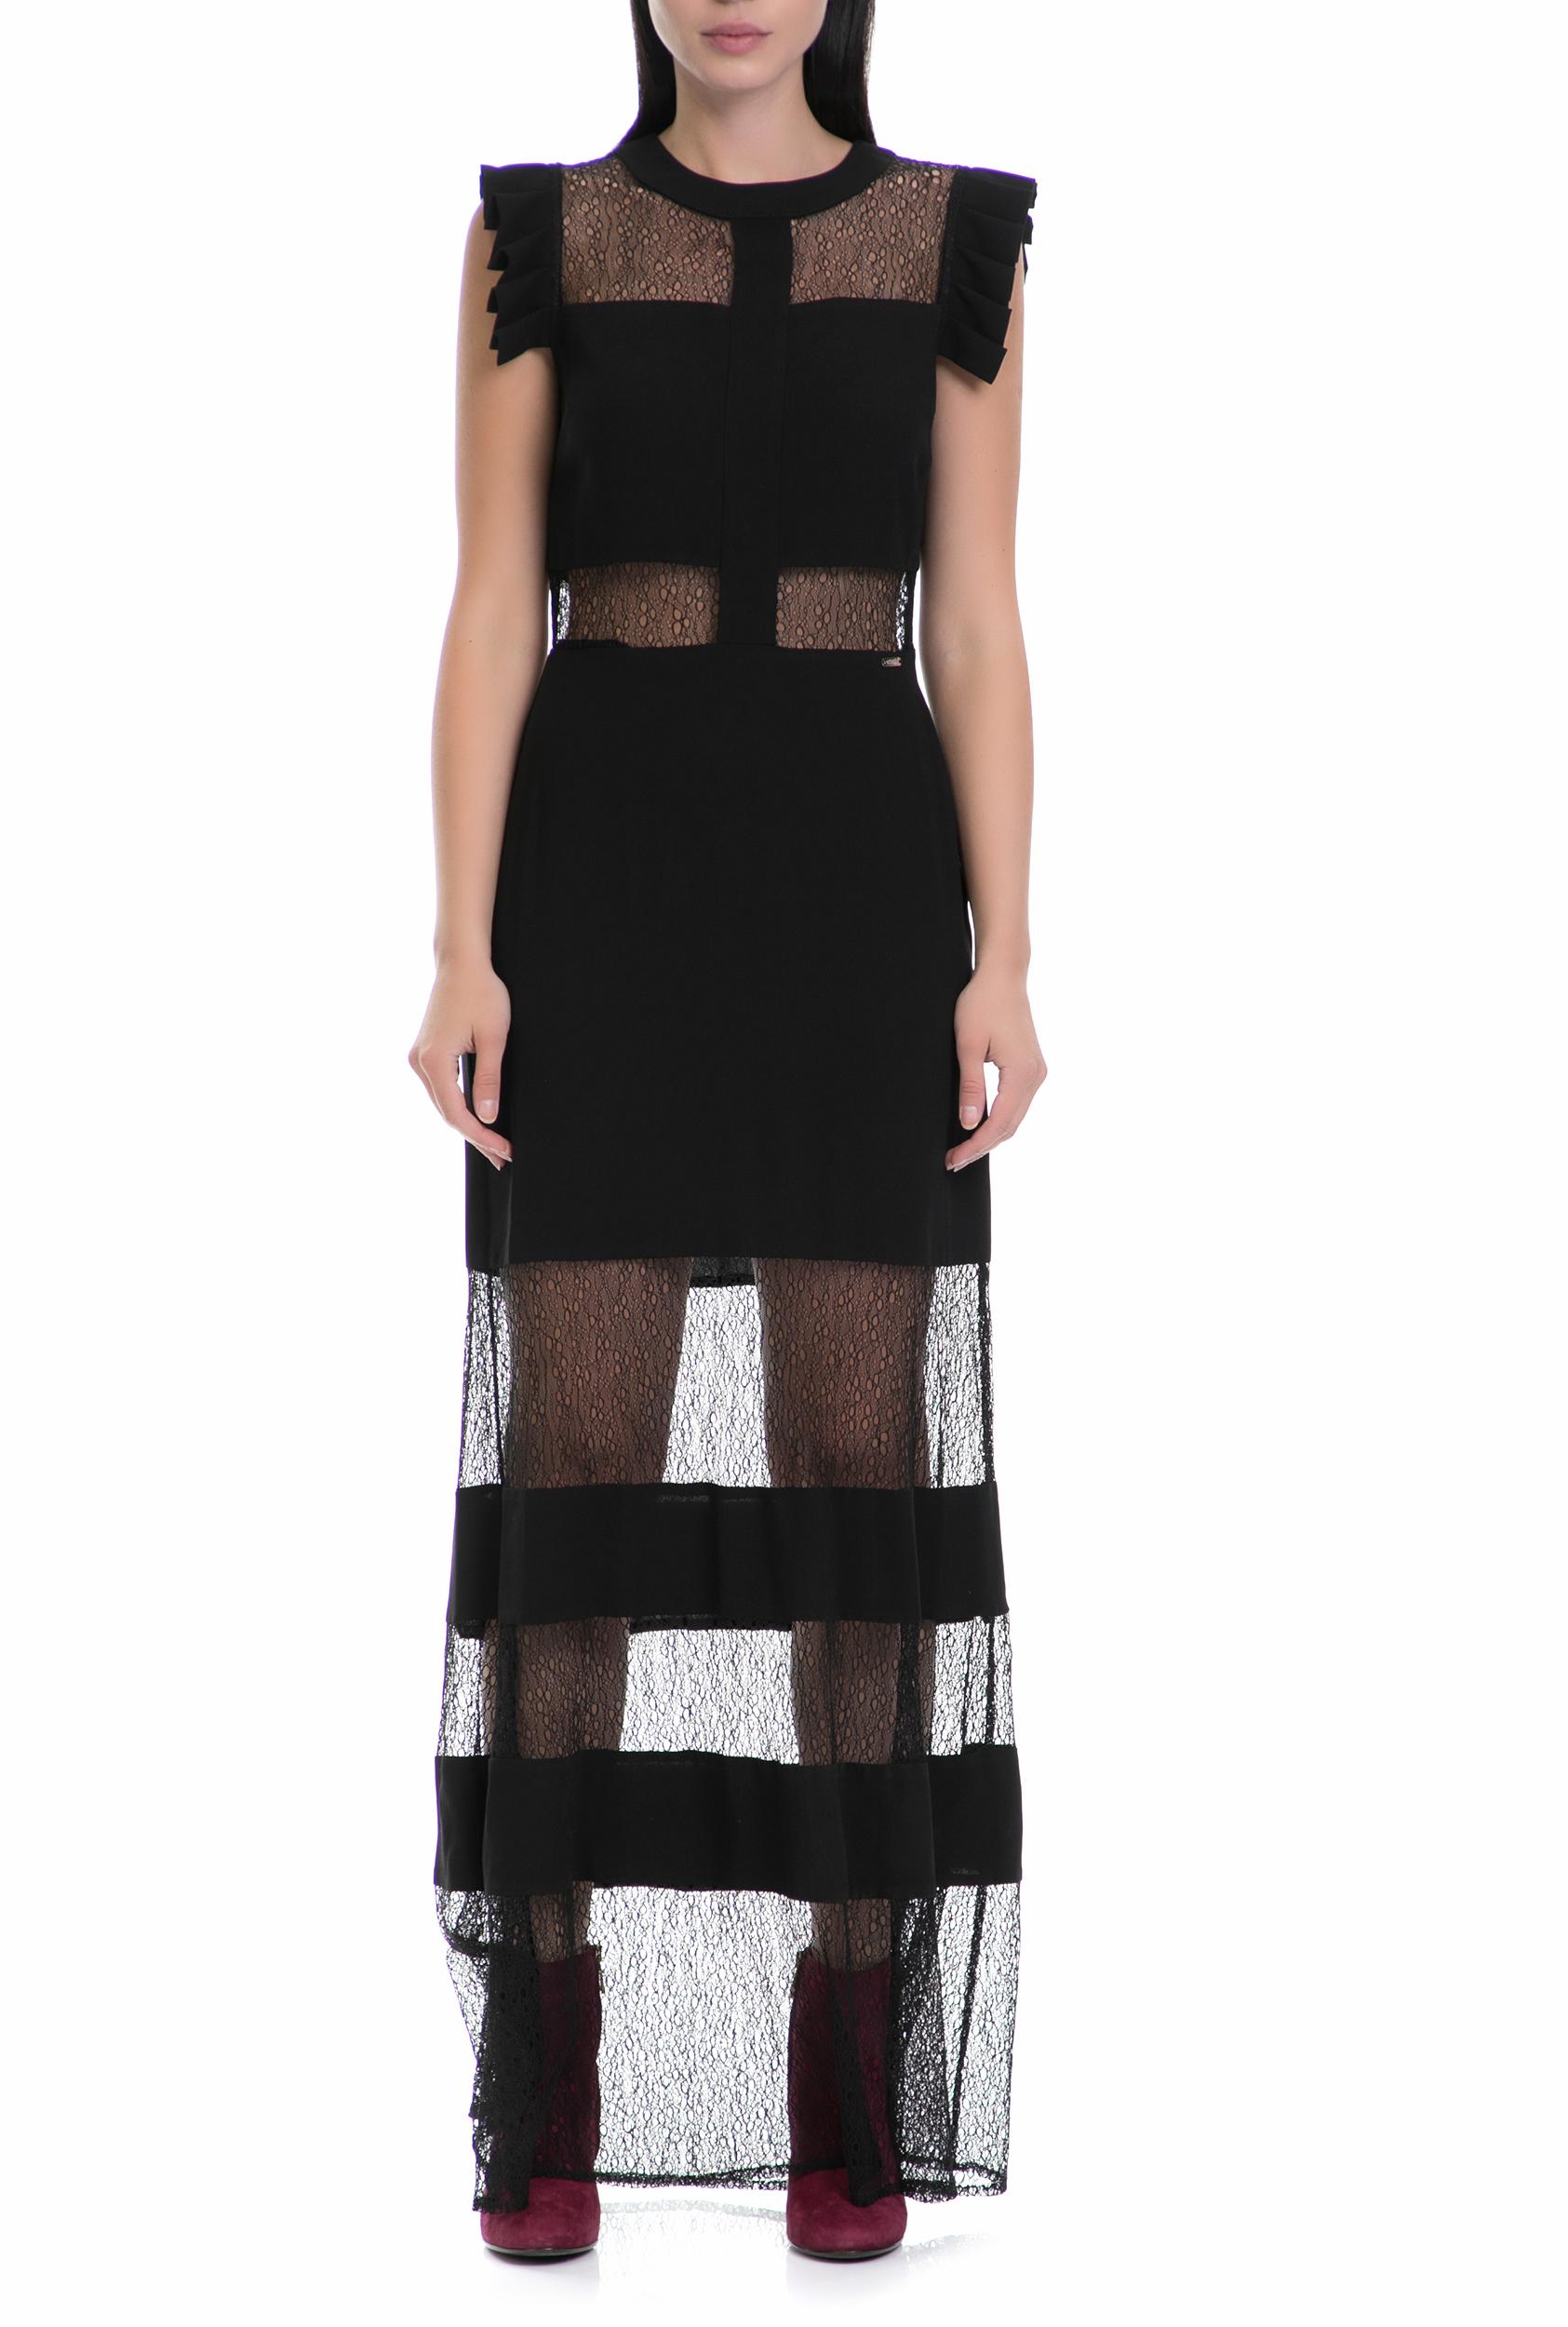 GUESS - Γυναικείο φόρεμα LIZZY GUESS μαύρο γυναικεία ρούχα φορέματα μάξι